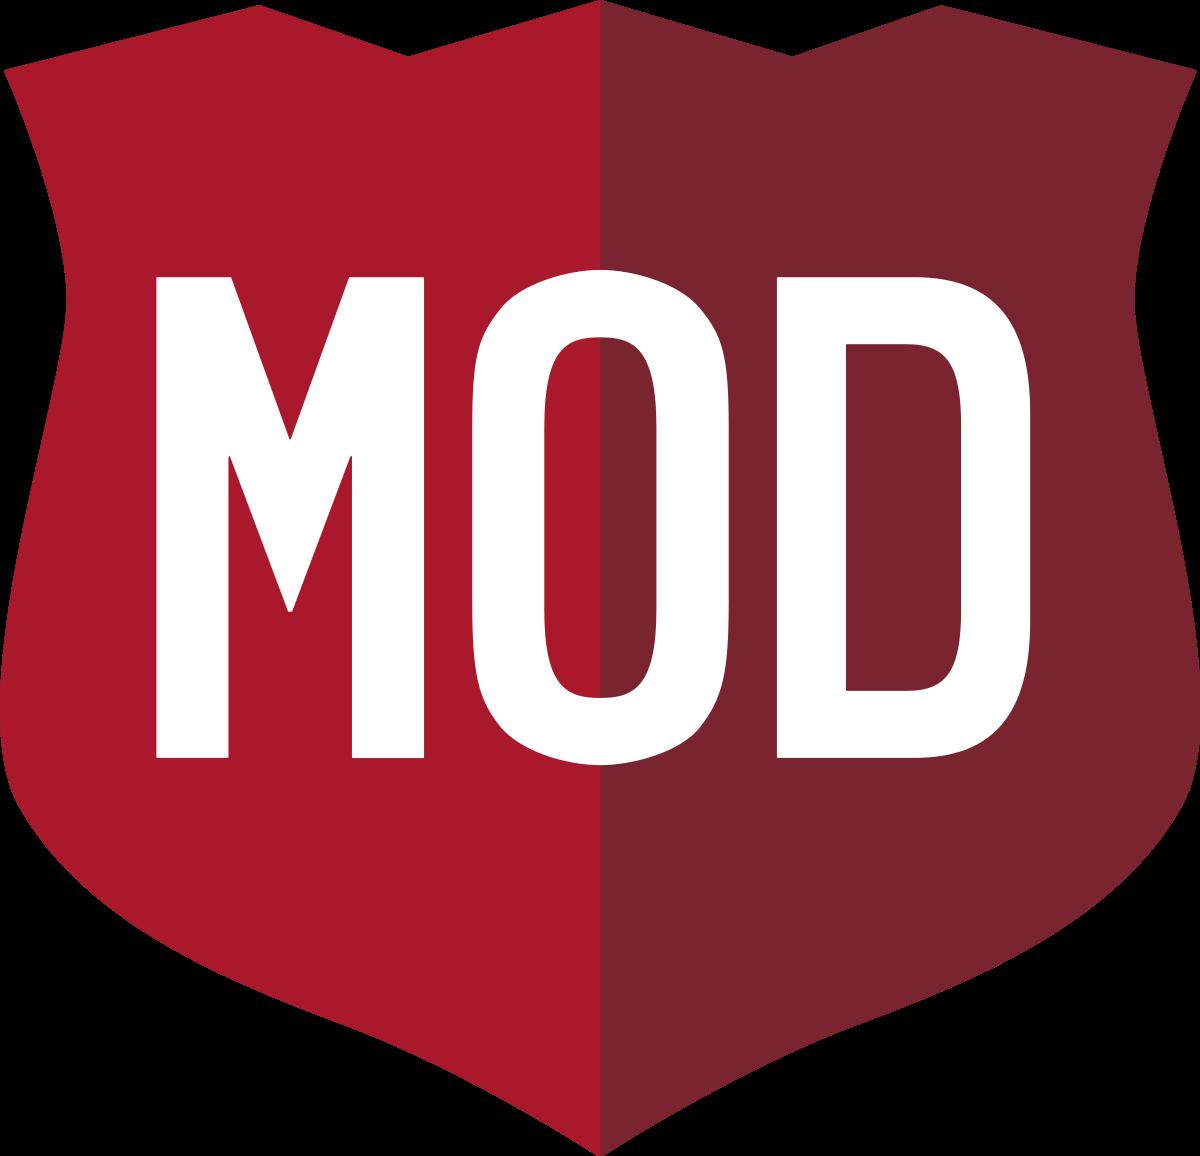 MOD Pizza - Norris PTA Fun Run Food Sponsor 2019-20